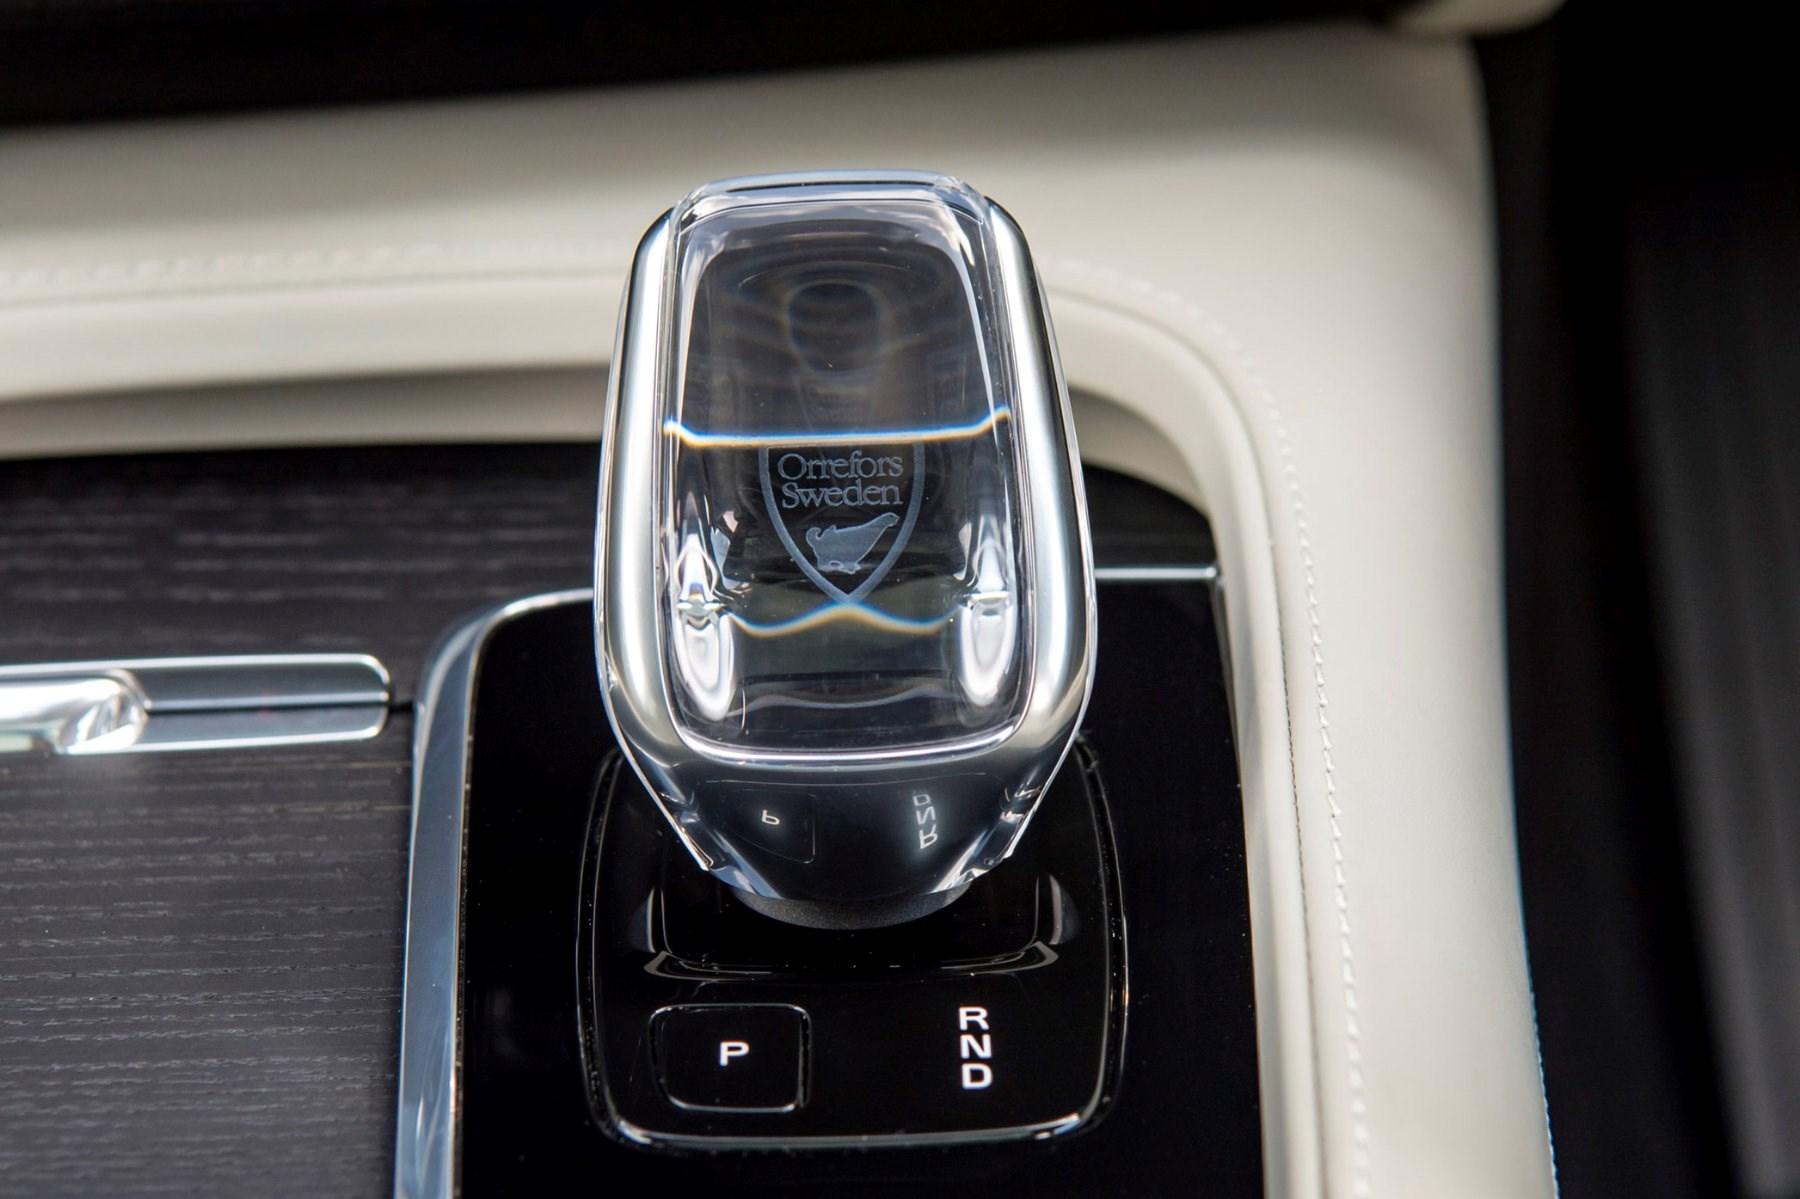 Volvo crystal